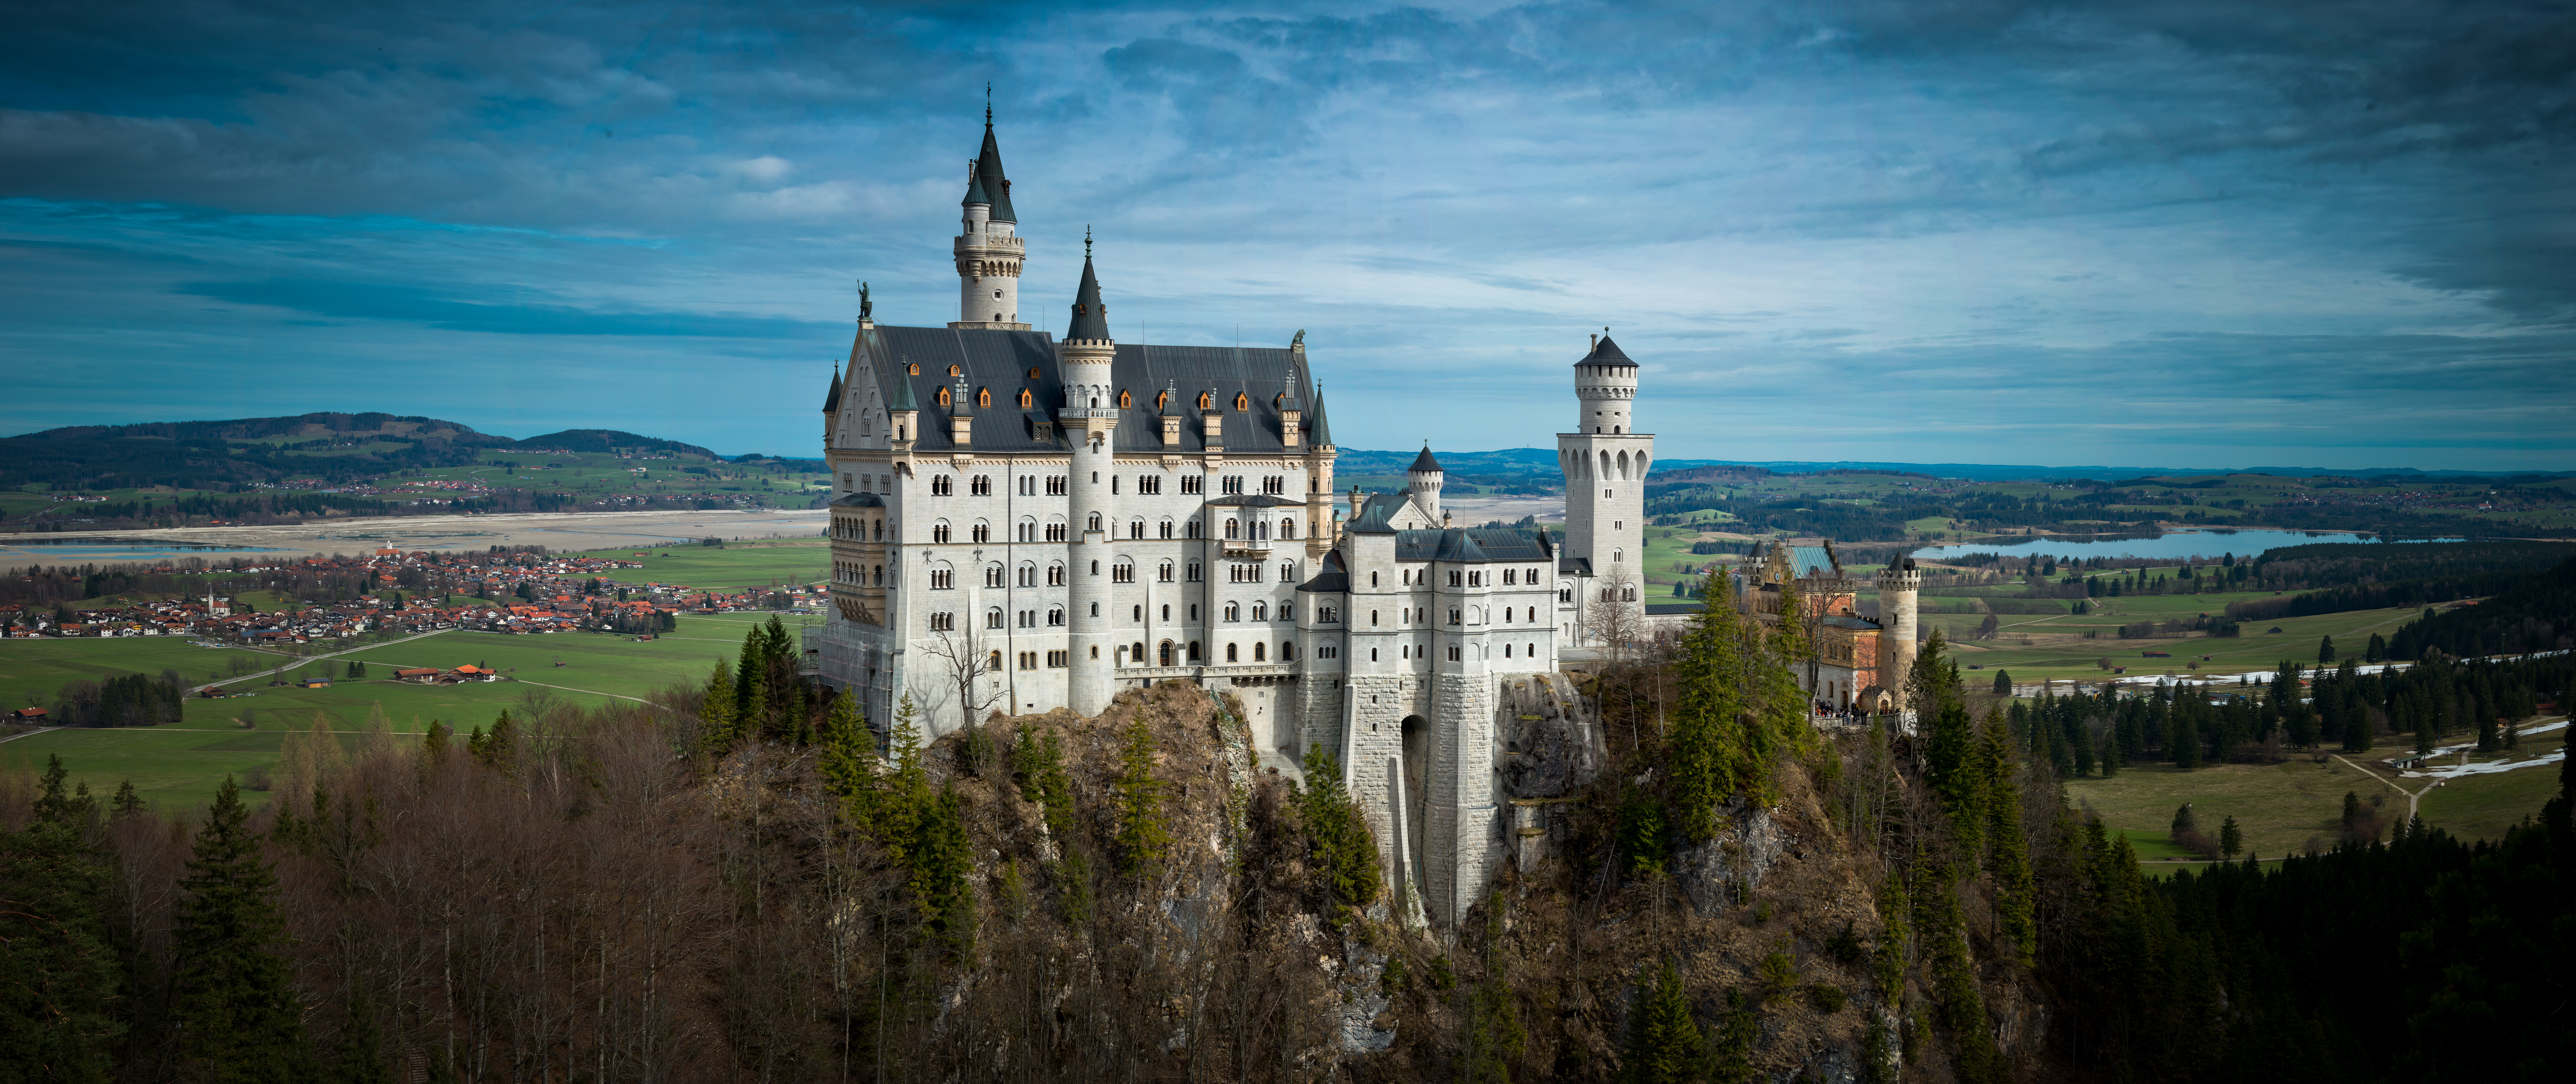 Neuschwanstein Castle, Bavaria, Germany бесплатно